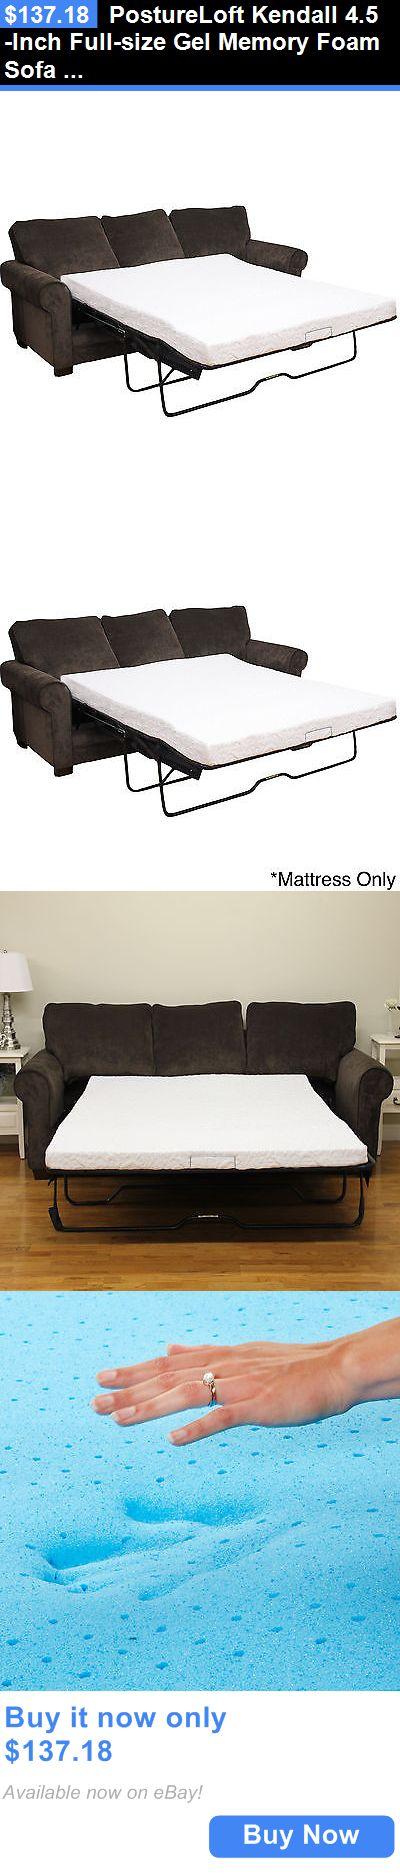 Bedding: Postureloft Kendall 4.5-Inch Full-Size Gel Memory Foam Sofa Bed Mattress BUY IT NOW ONLY: $137.18